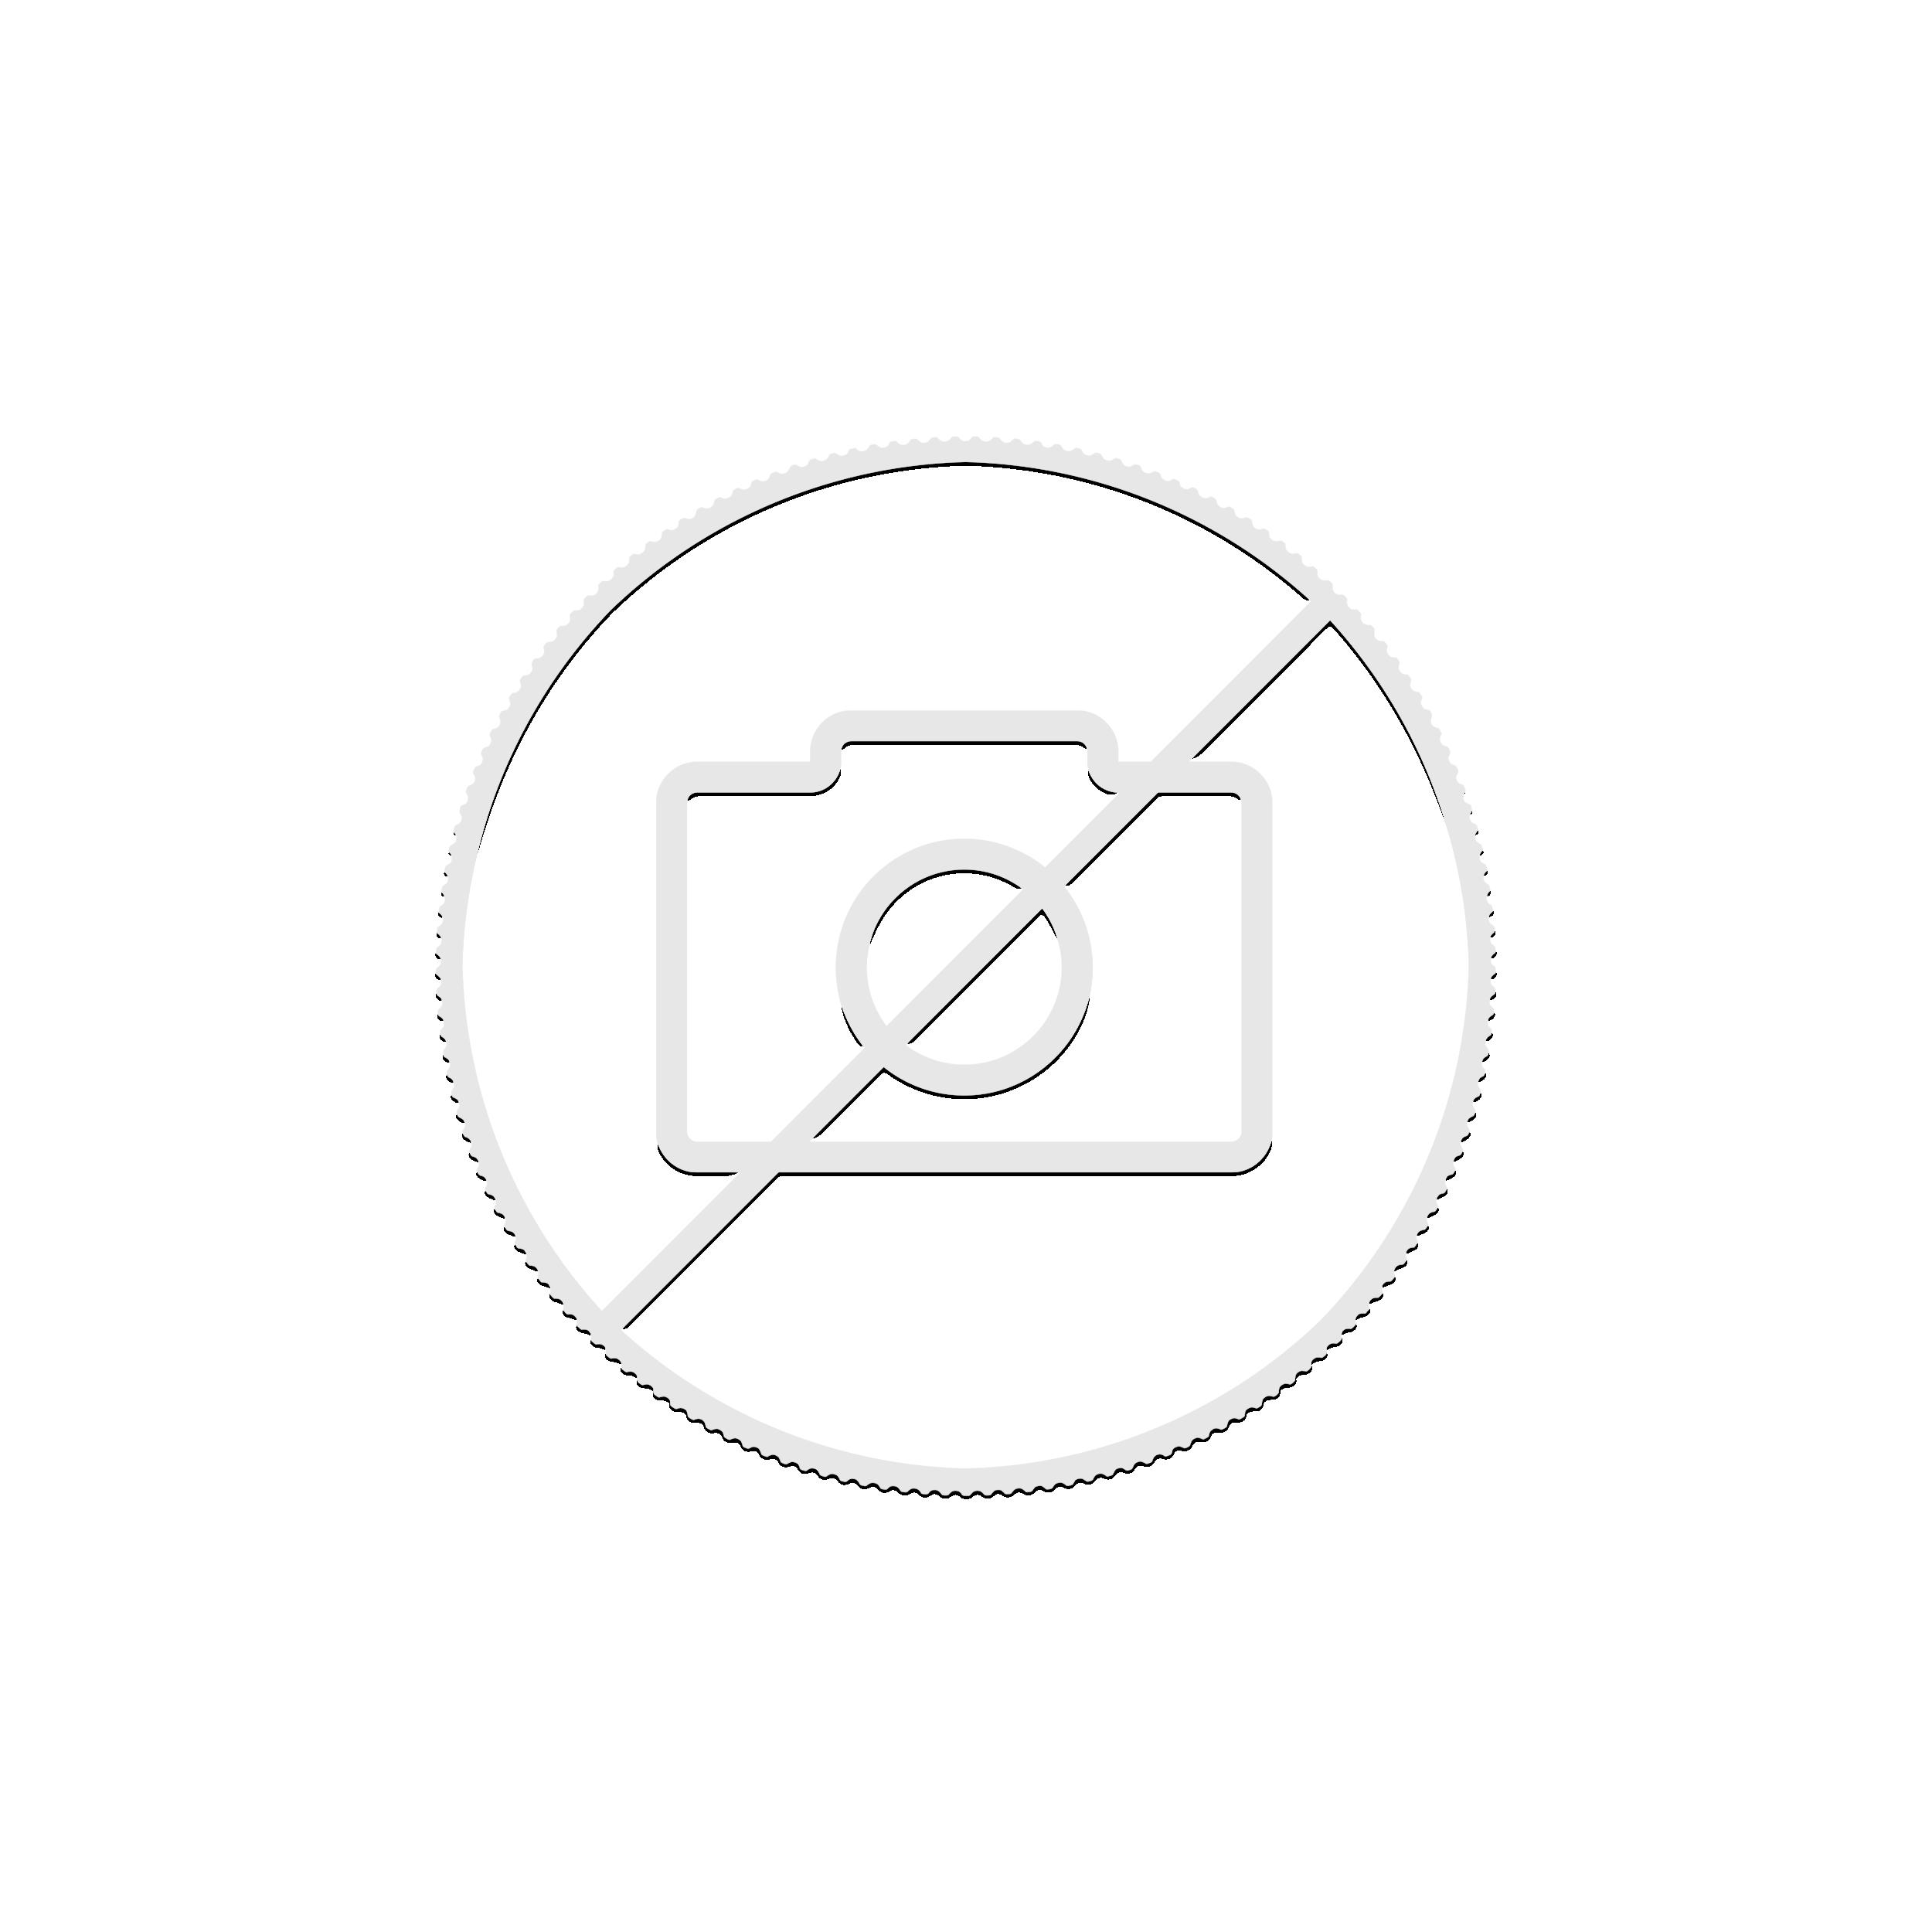 Gold bar 50 grams Perth Mint